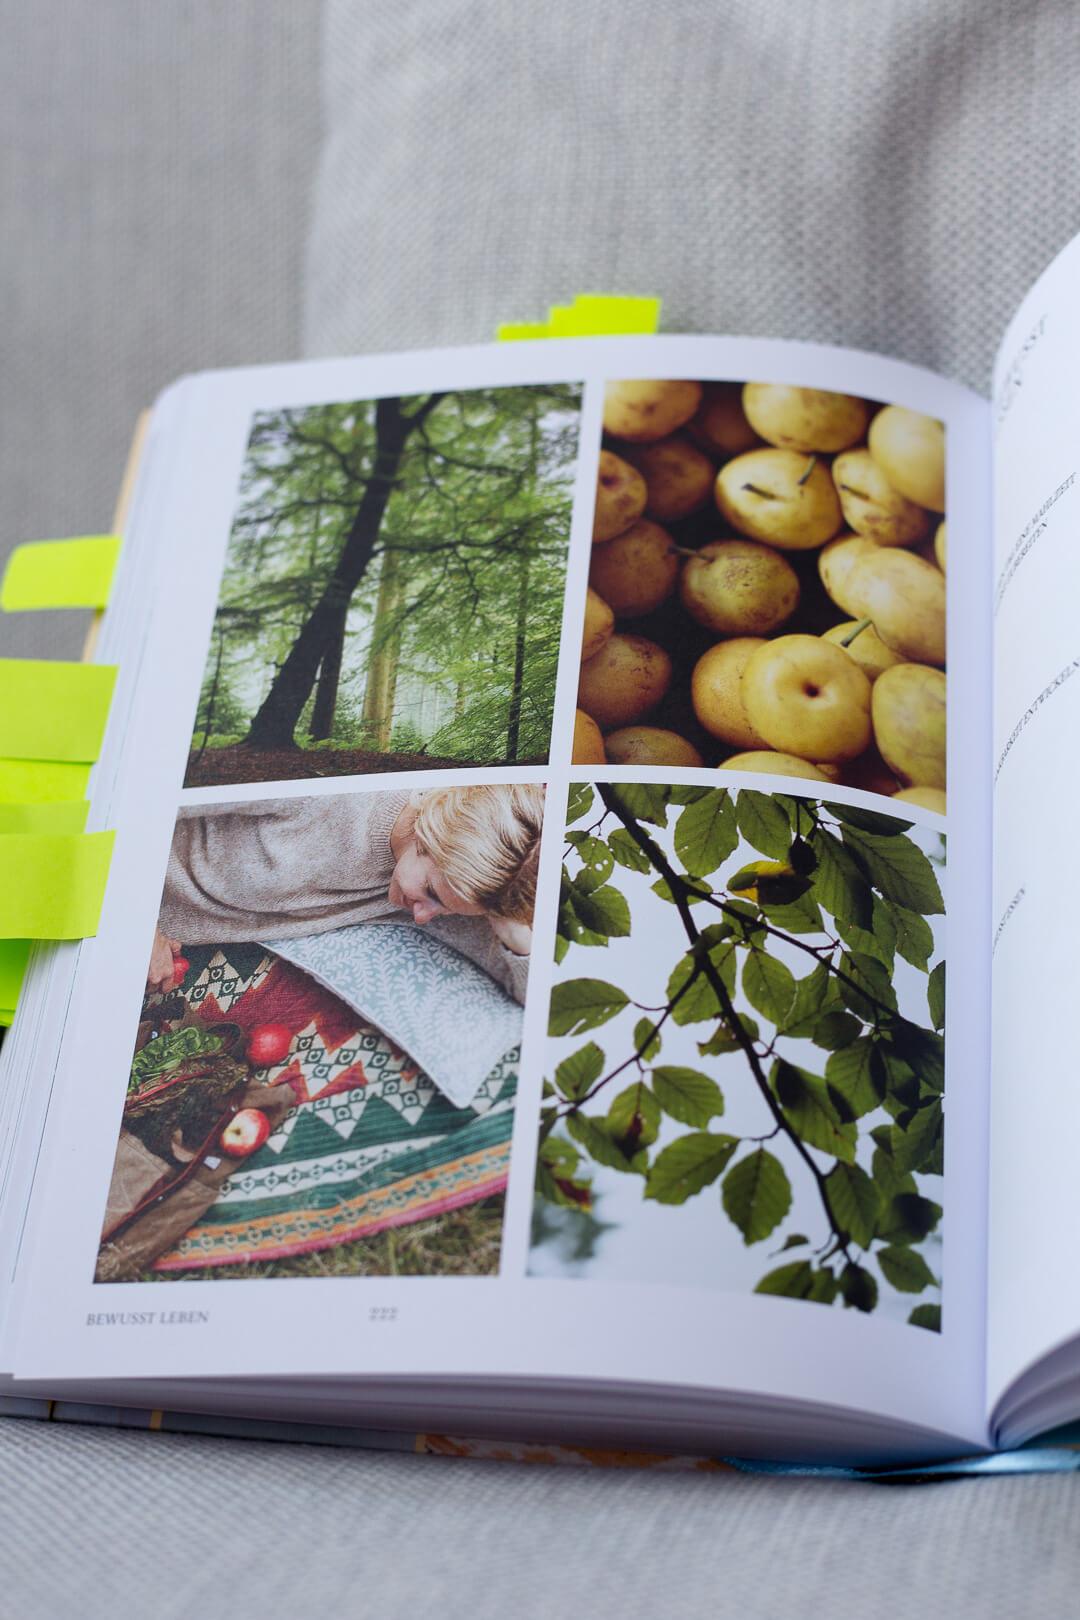 La Naturalista, La Naturalista Rezension, einfach leben Buch, Minimalismus Buch, La Naturalista, Xochi Balfour Buch, Xochi Balfour, natürlich leben Buch, Die Natürliche Rezension, natürlich leben